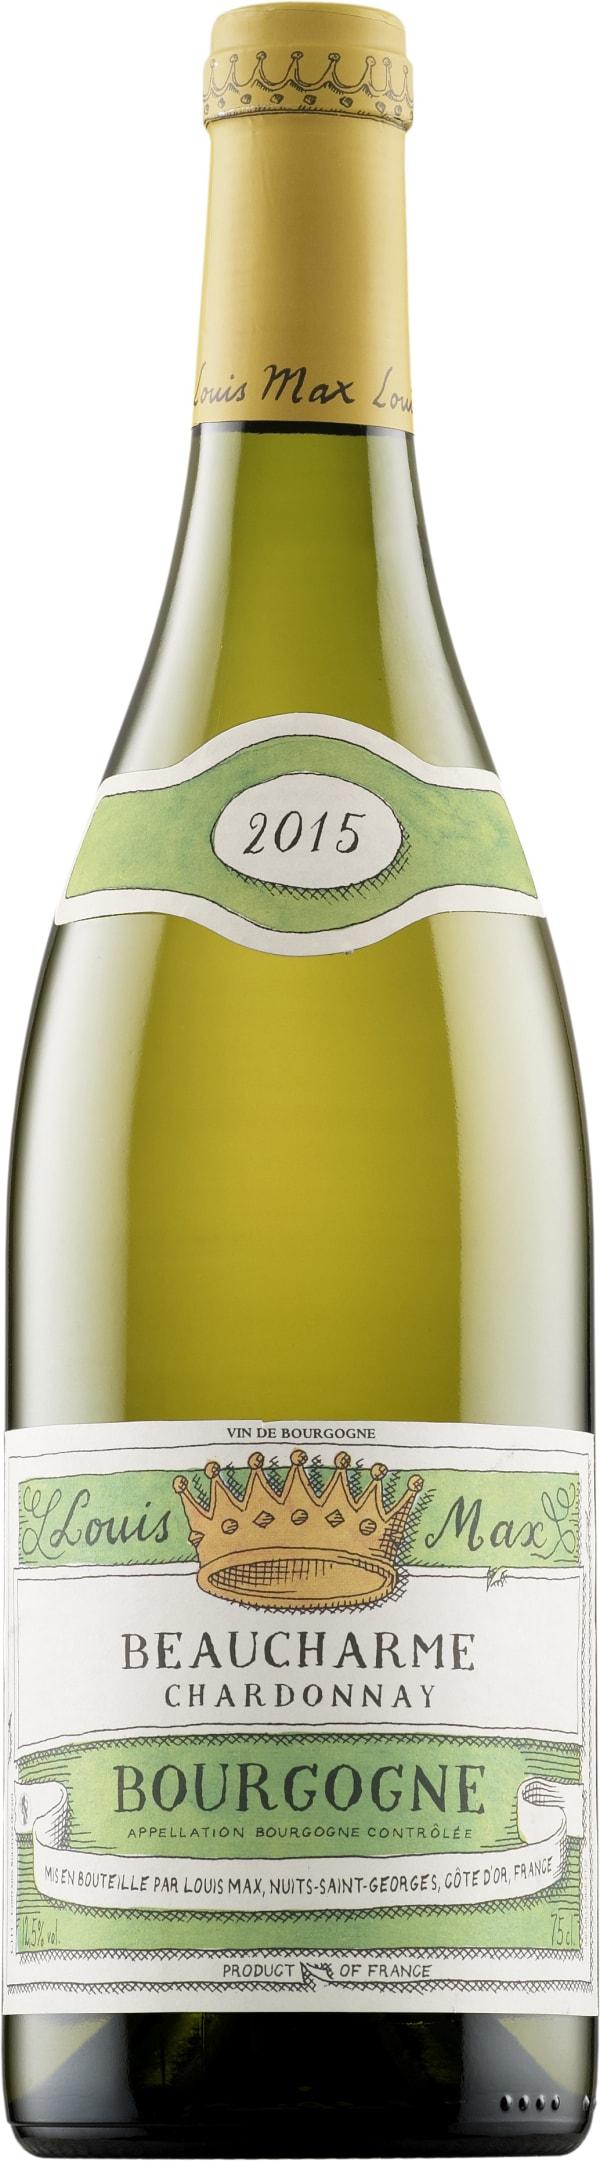 Louis Max Beaucharme Chardonnay 2015